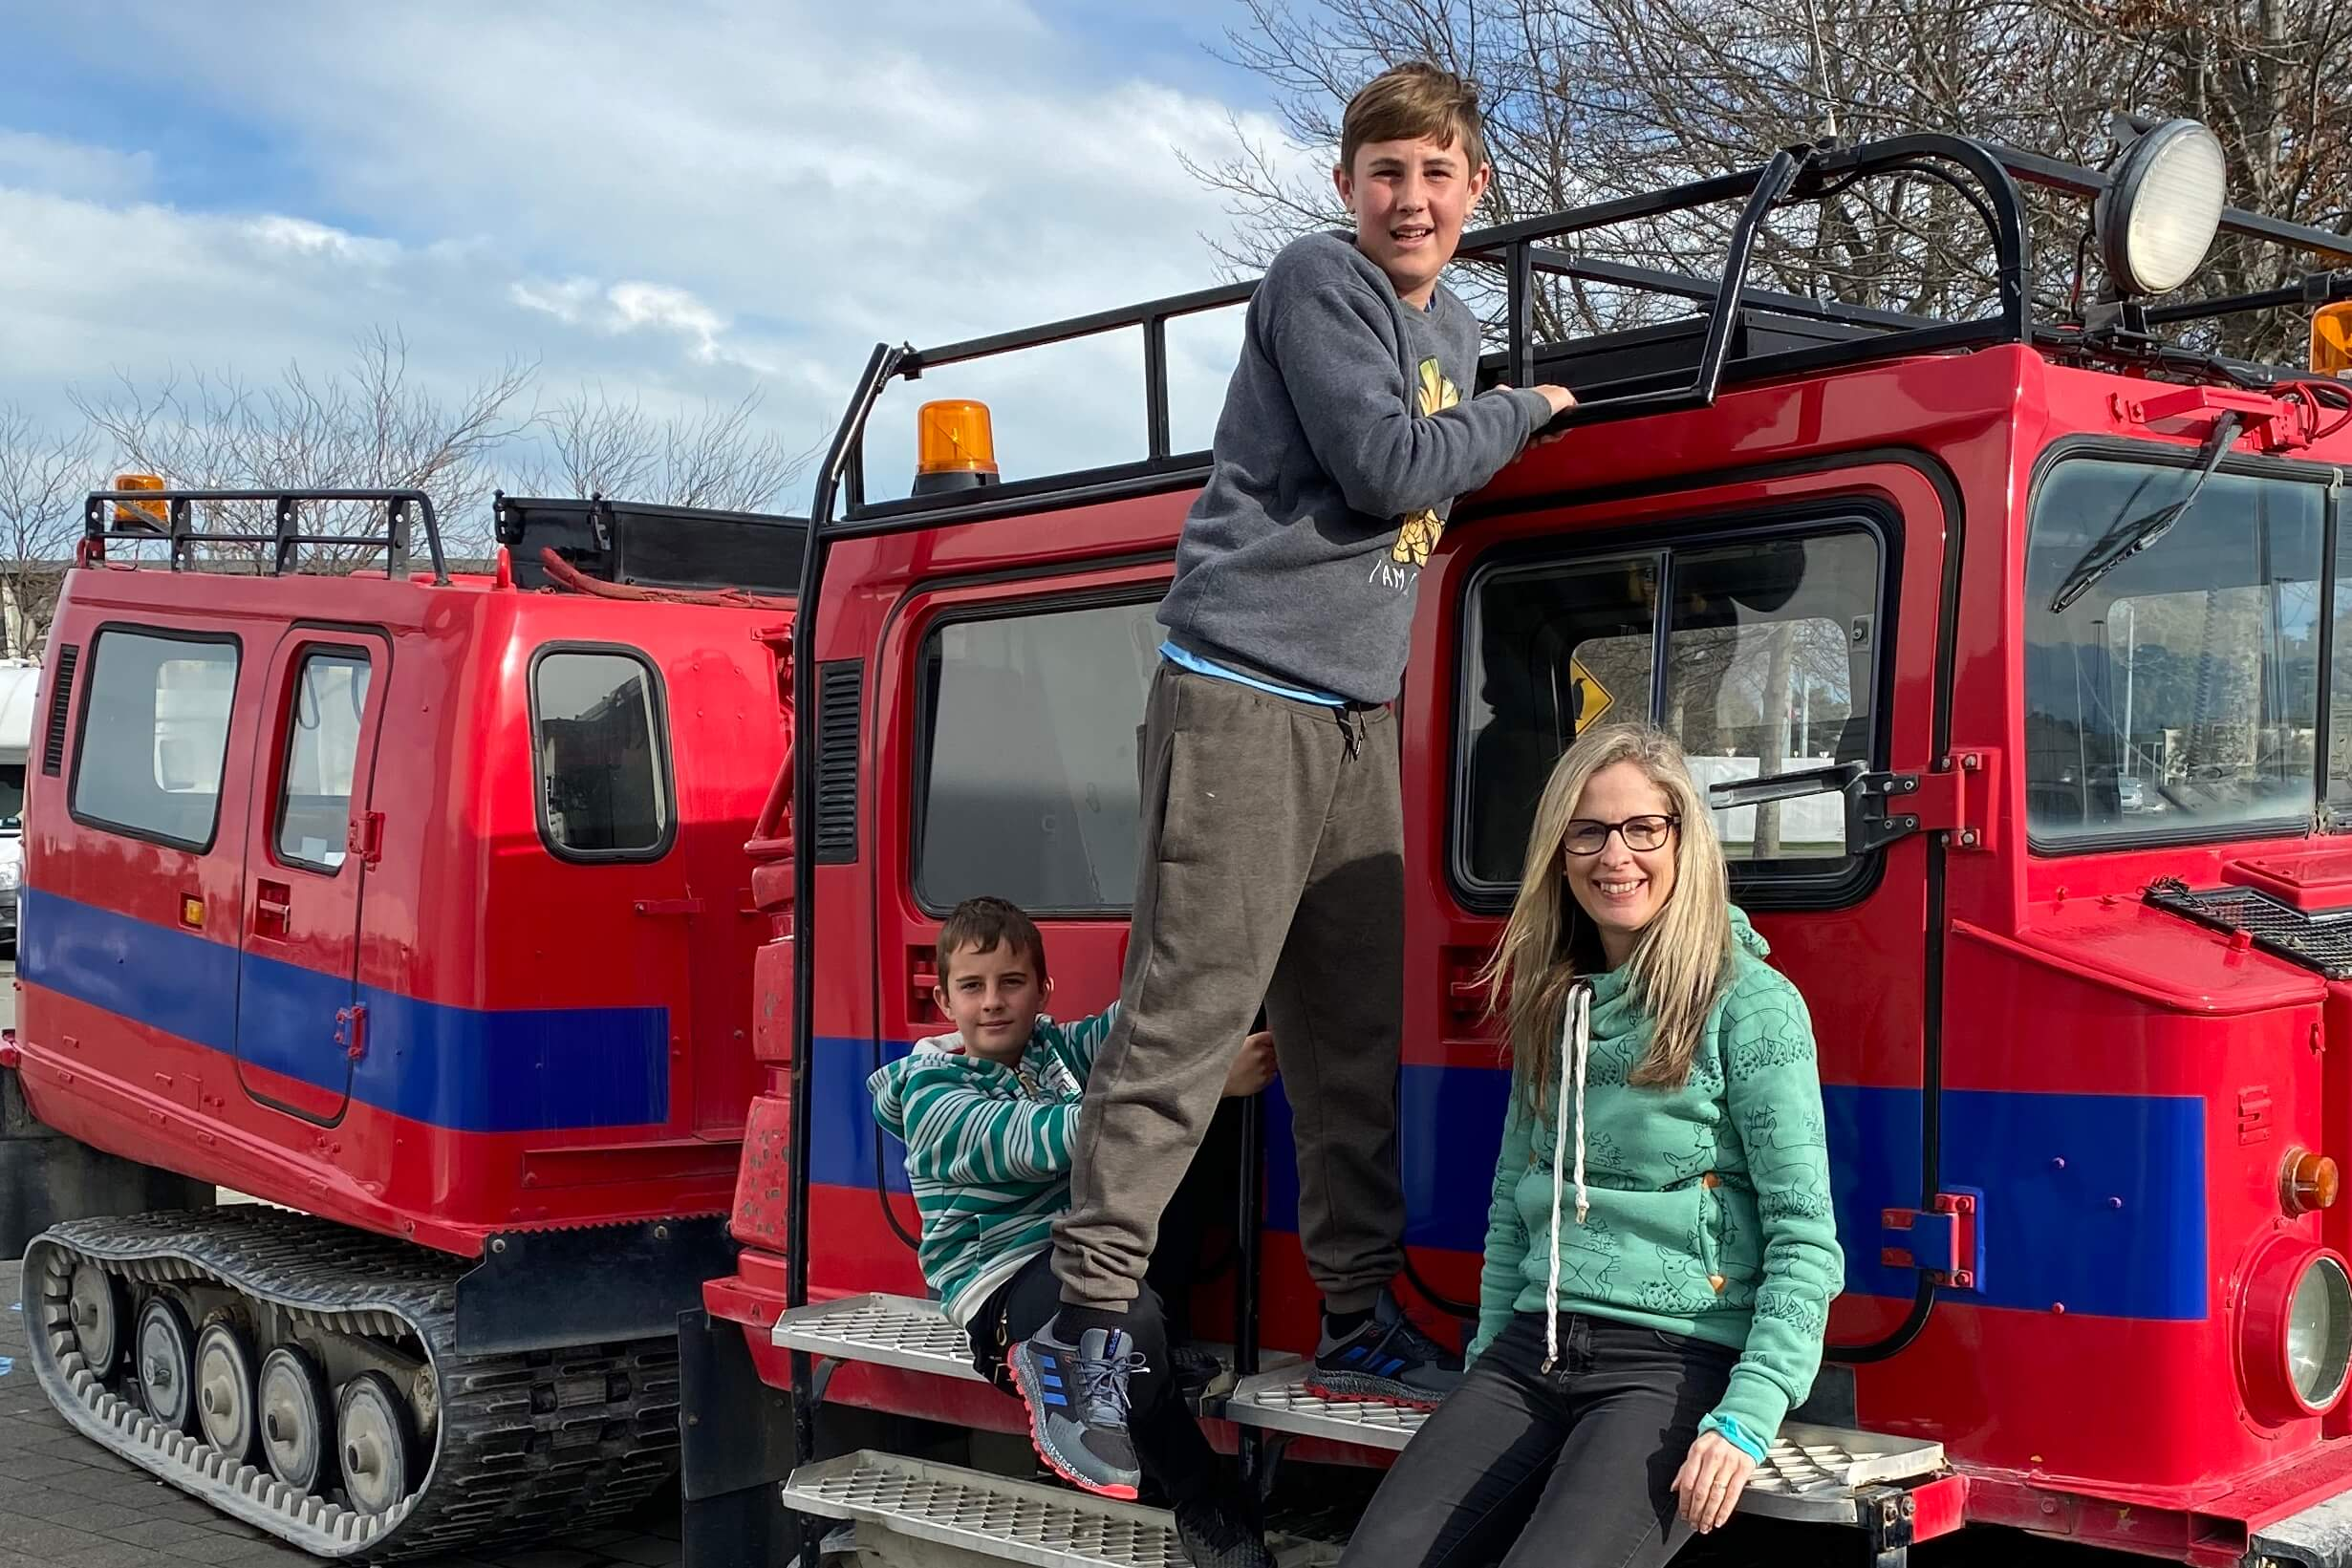 Family exploring Antarctic Centre in Christchurch